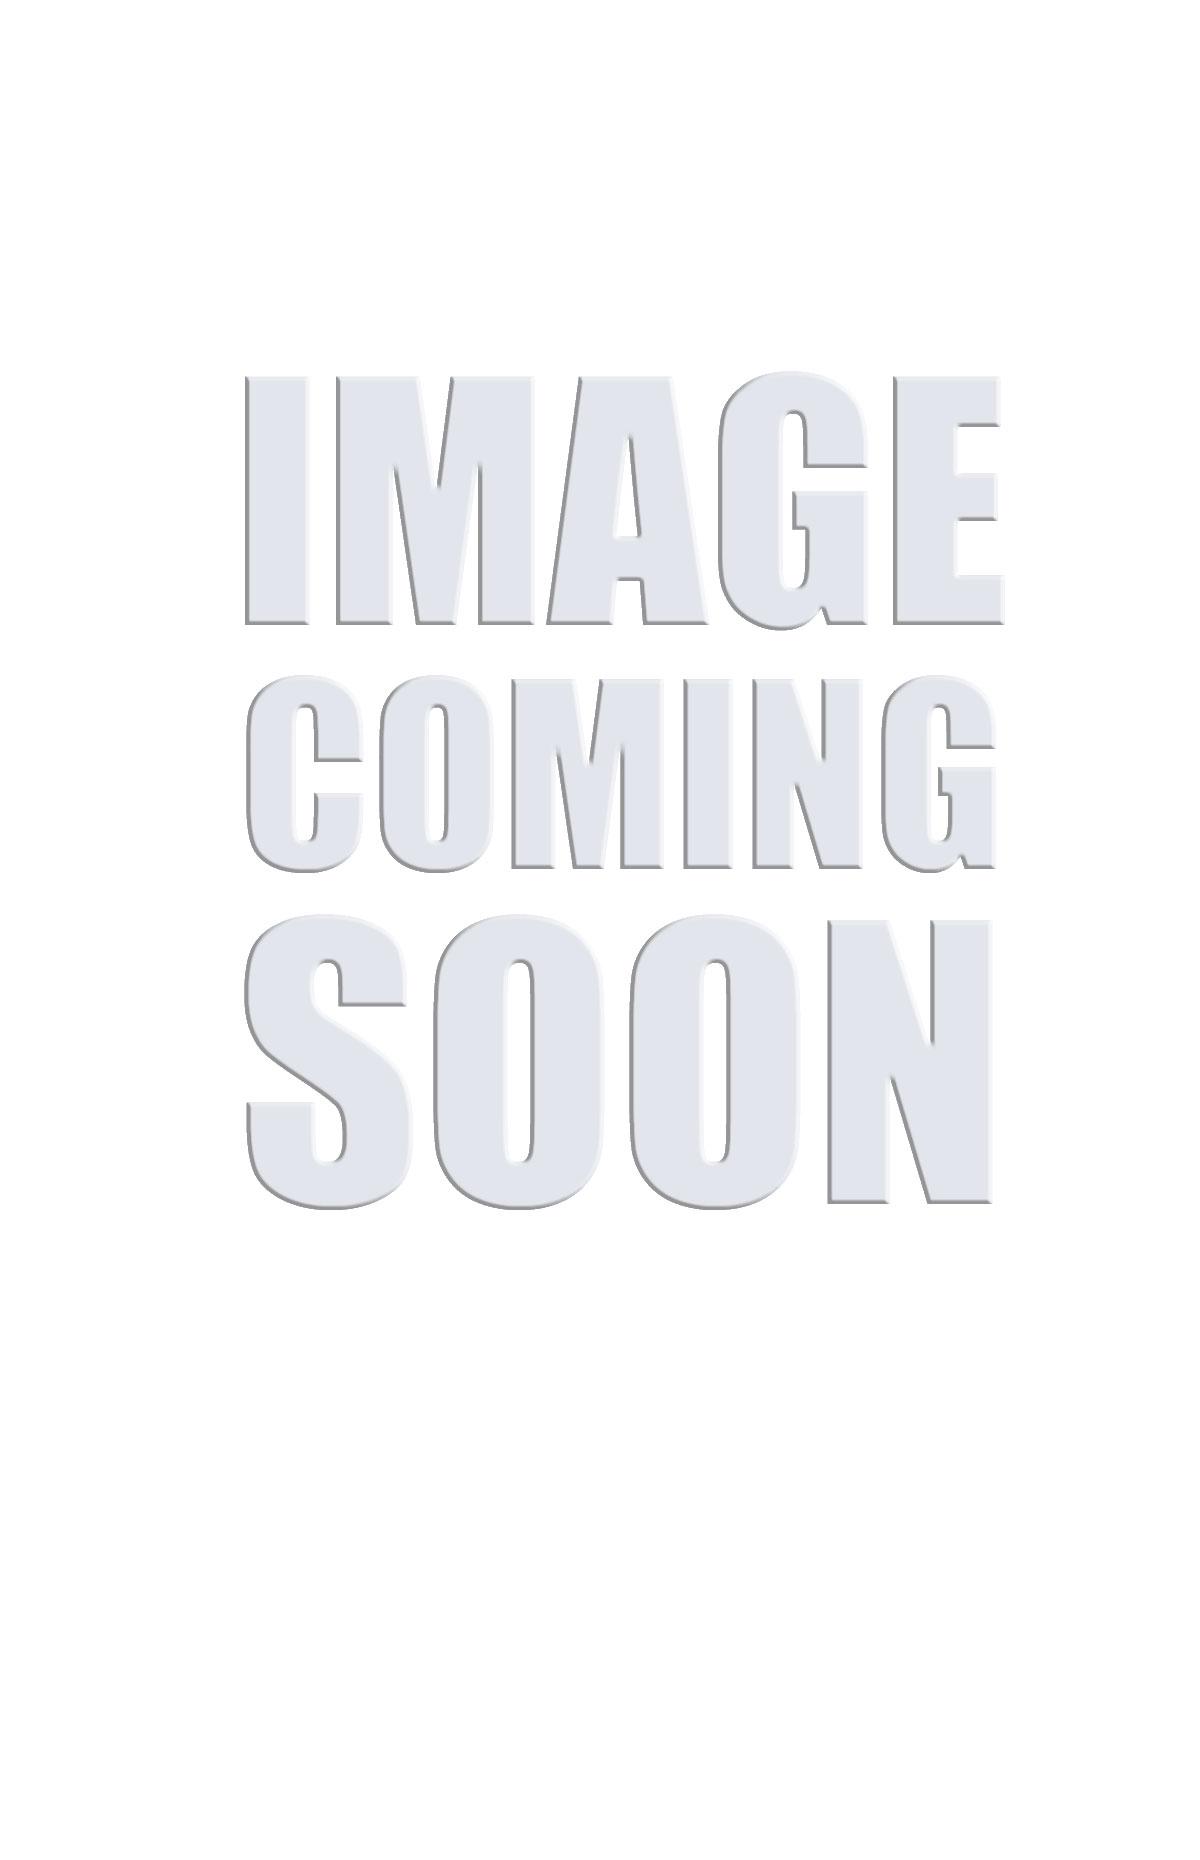 Upholstery Kit for the PFX900S